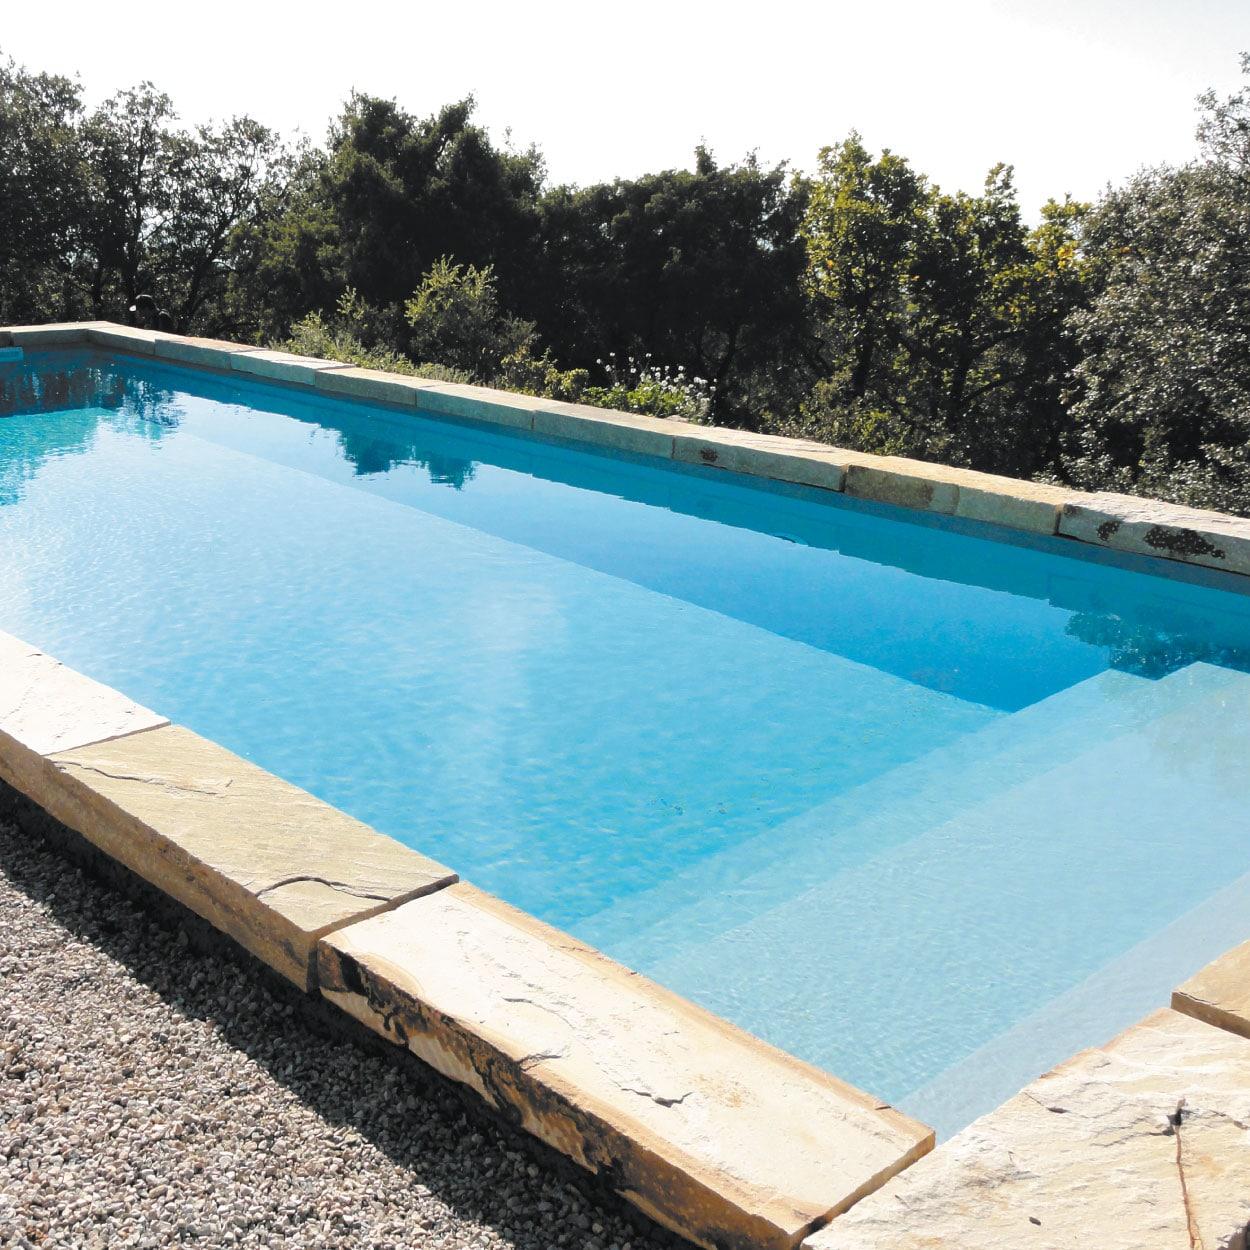 realisation-piscine-coque-sugiton Modèle Sugiton